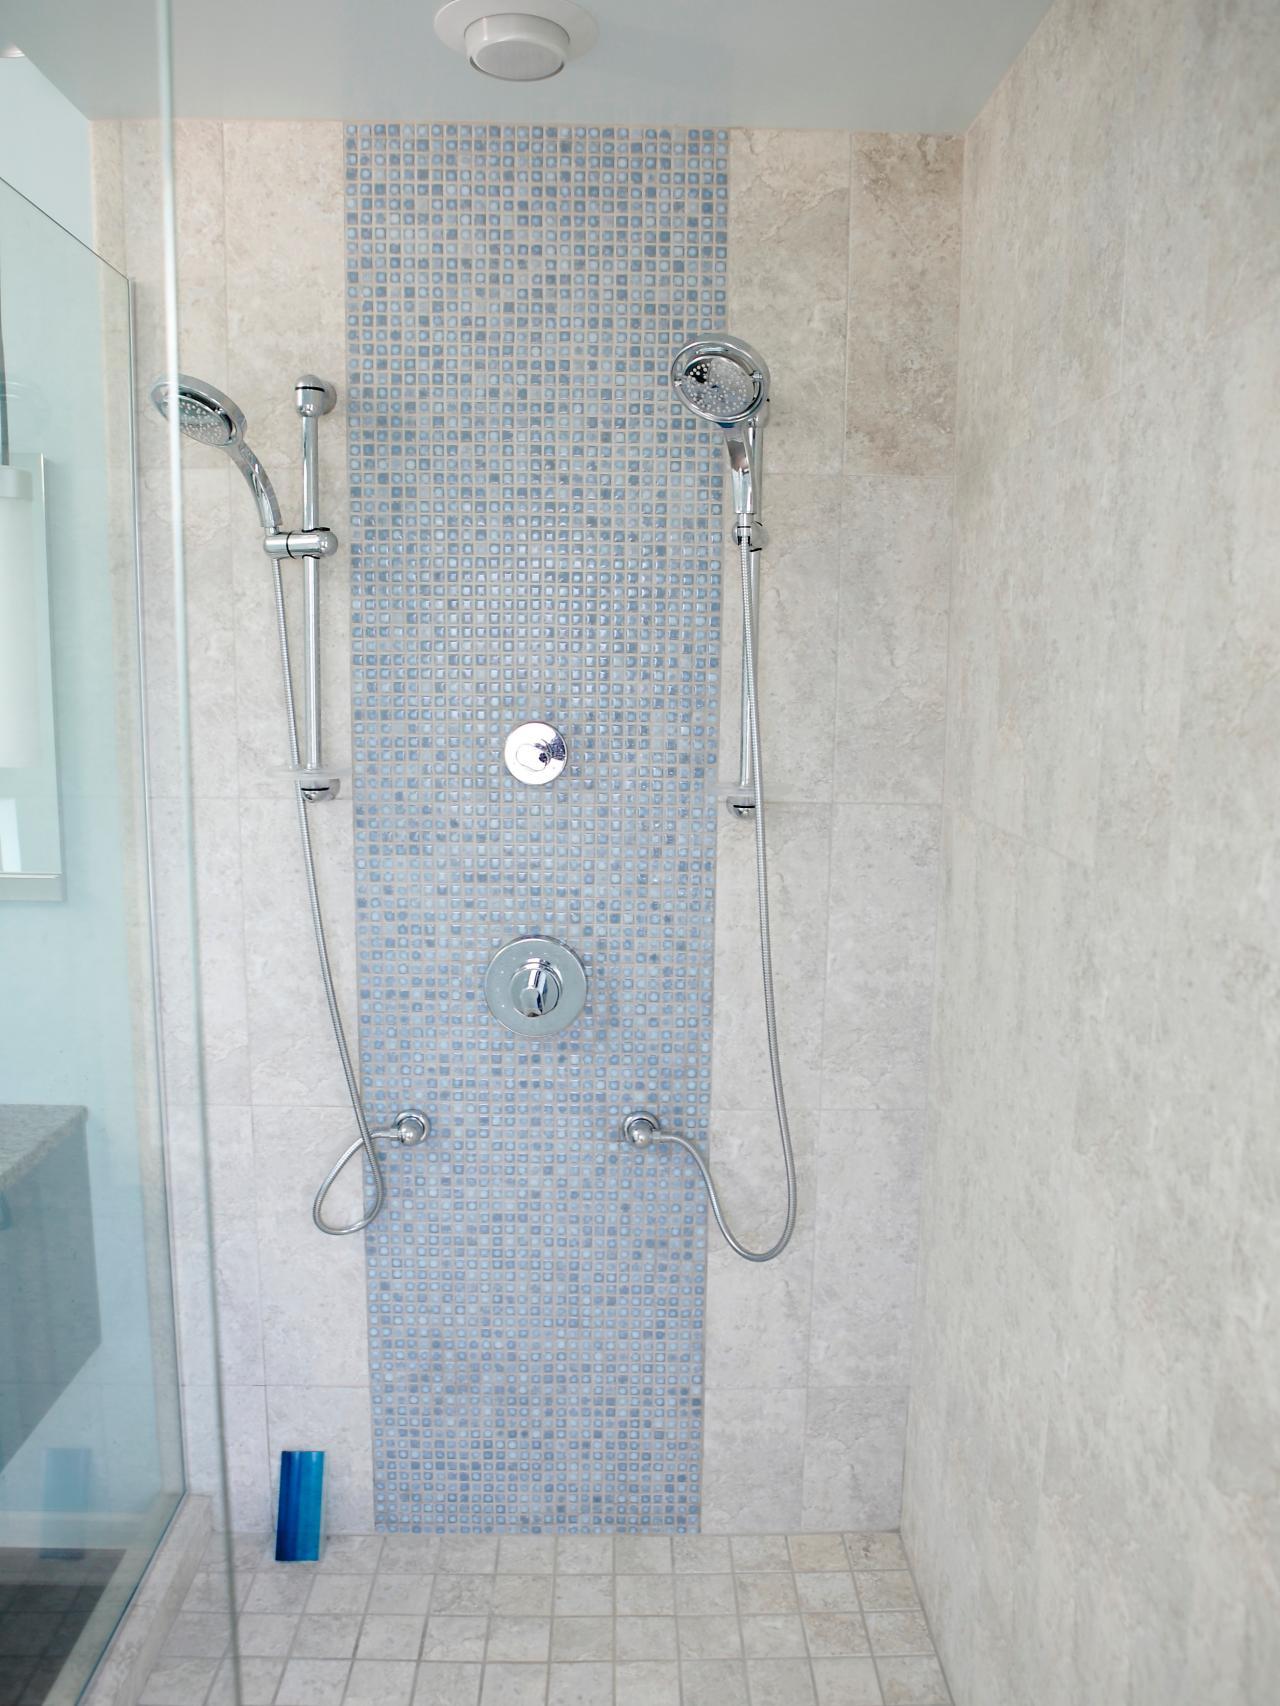 DBCR207_shower-tile_s3x4.jpg.rend.hgtvcom.1280.1707